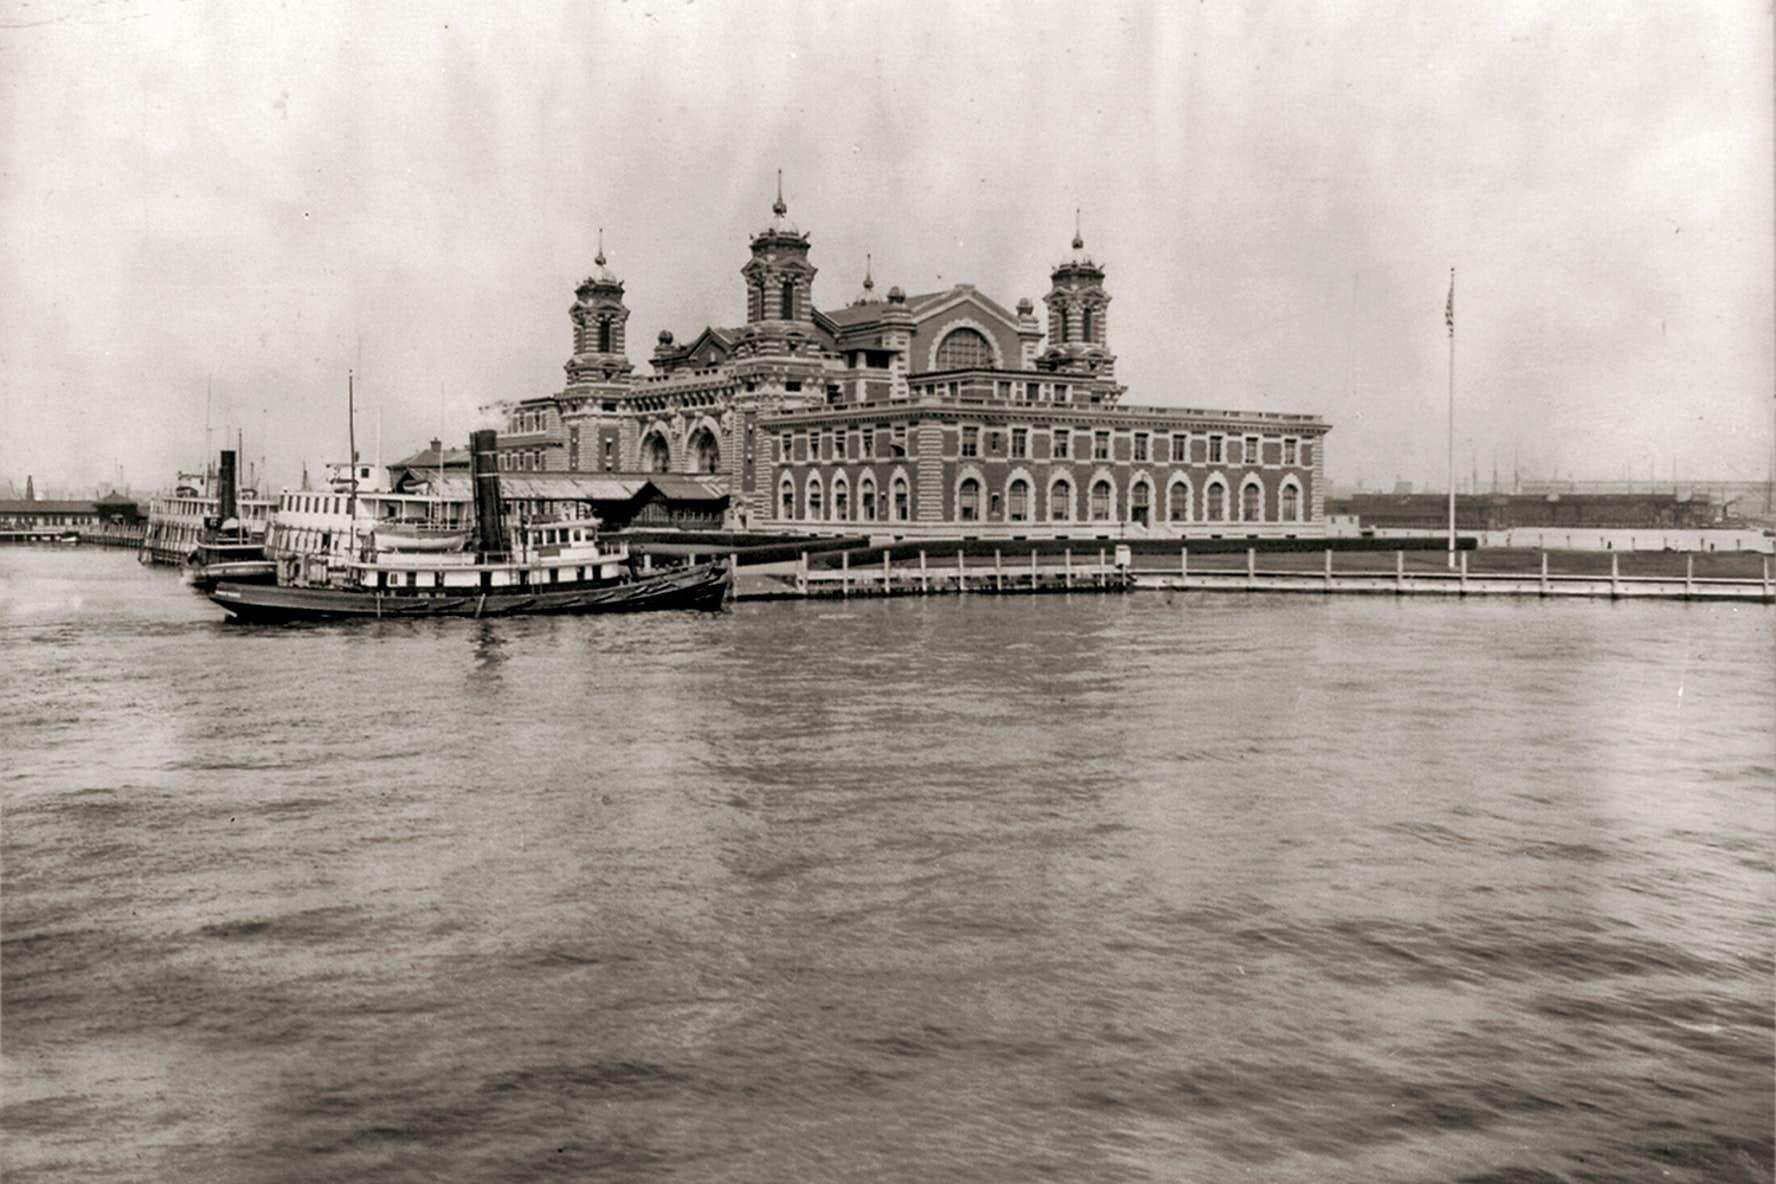 Ellis Island à la fin du XIXe siècle.